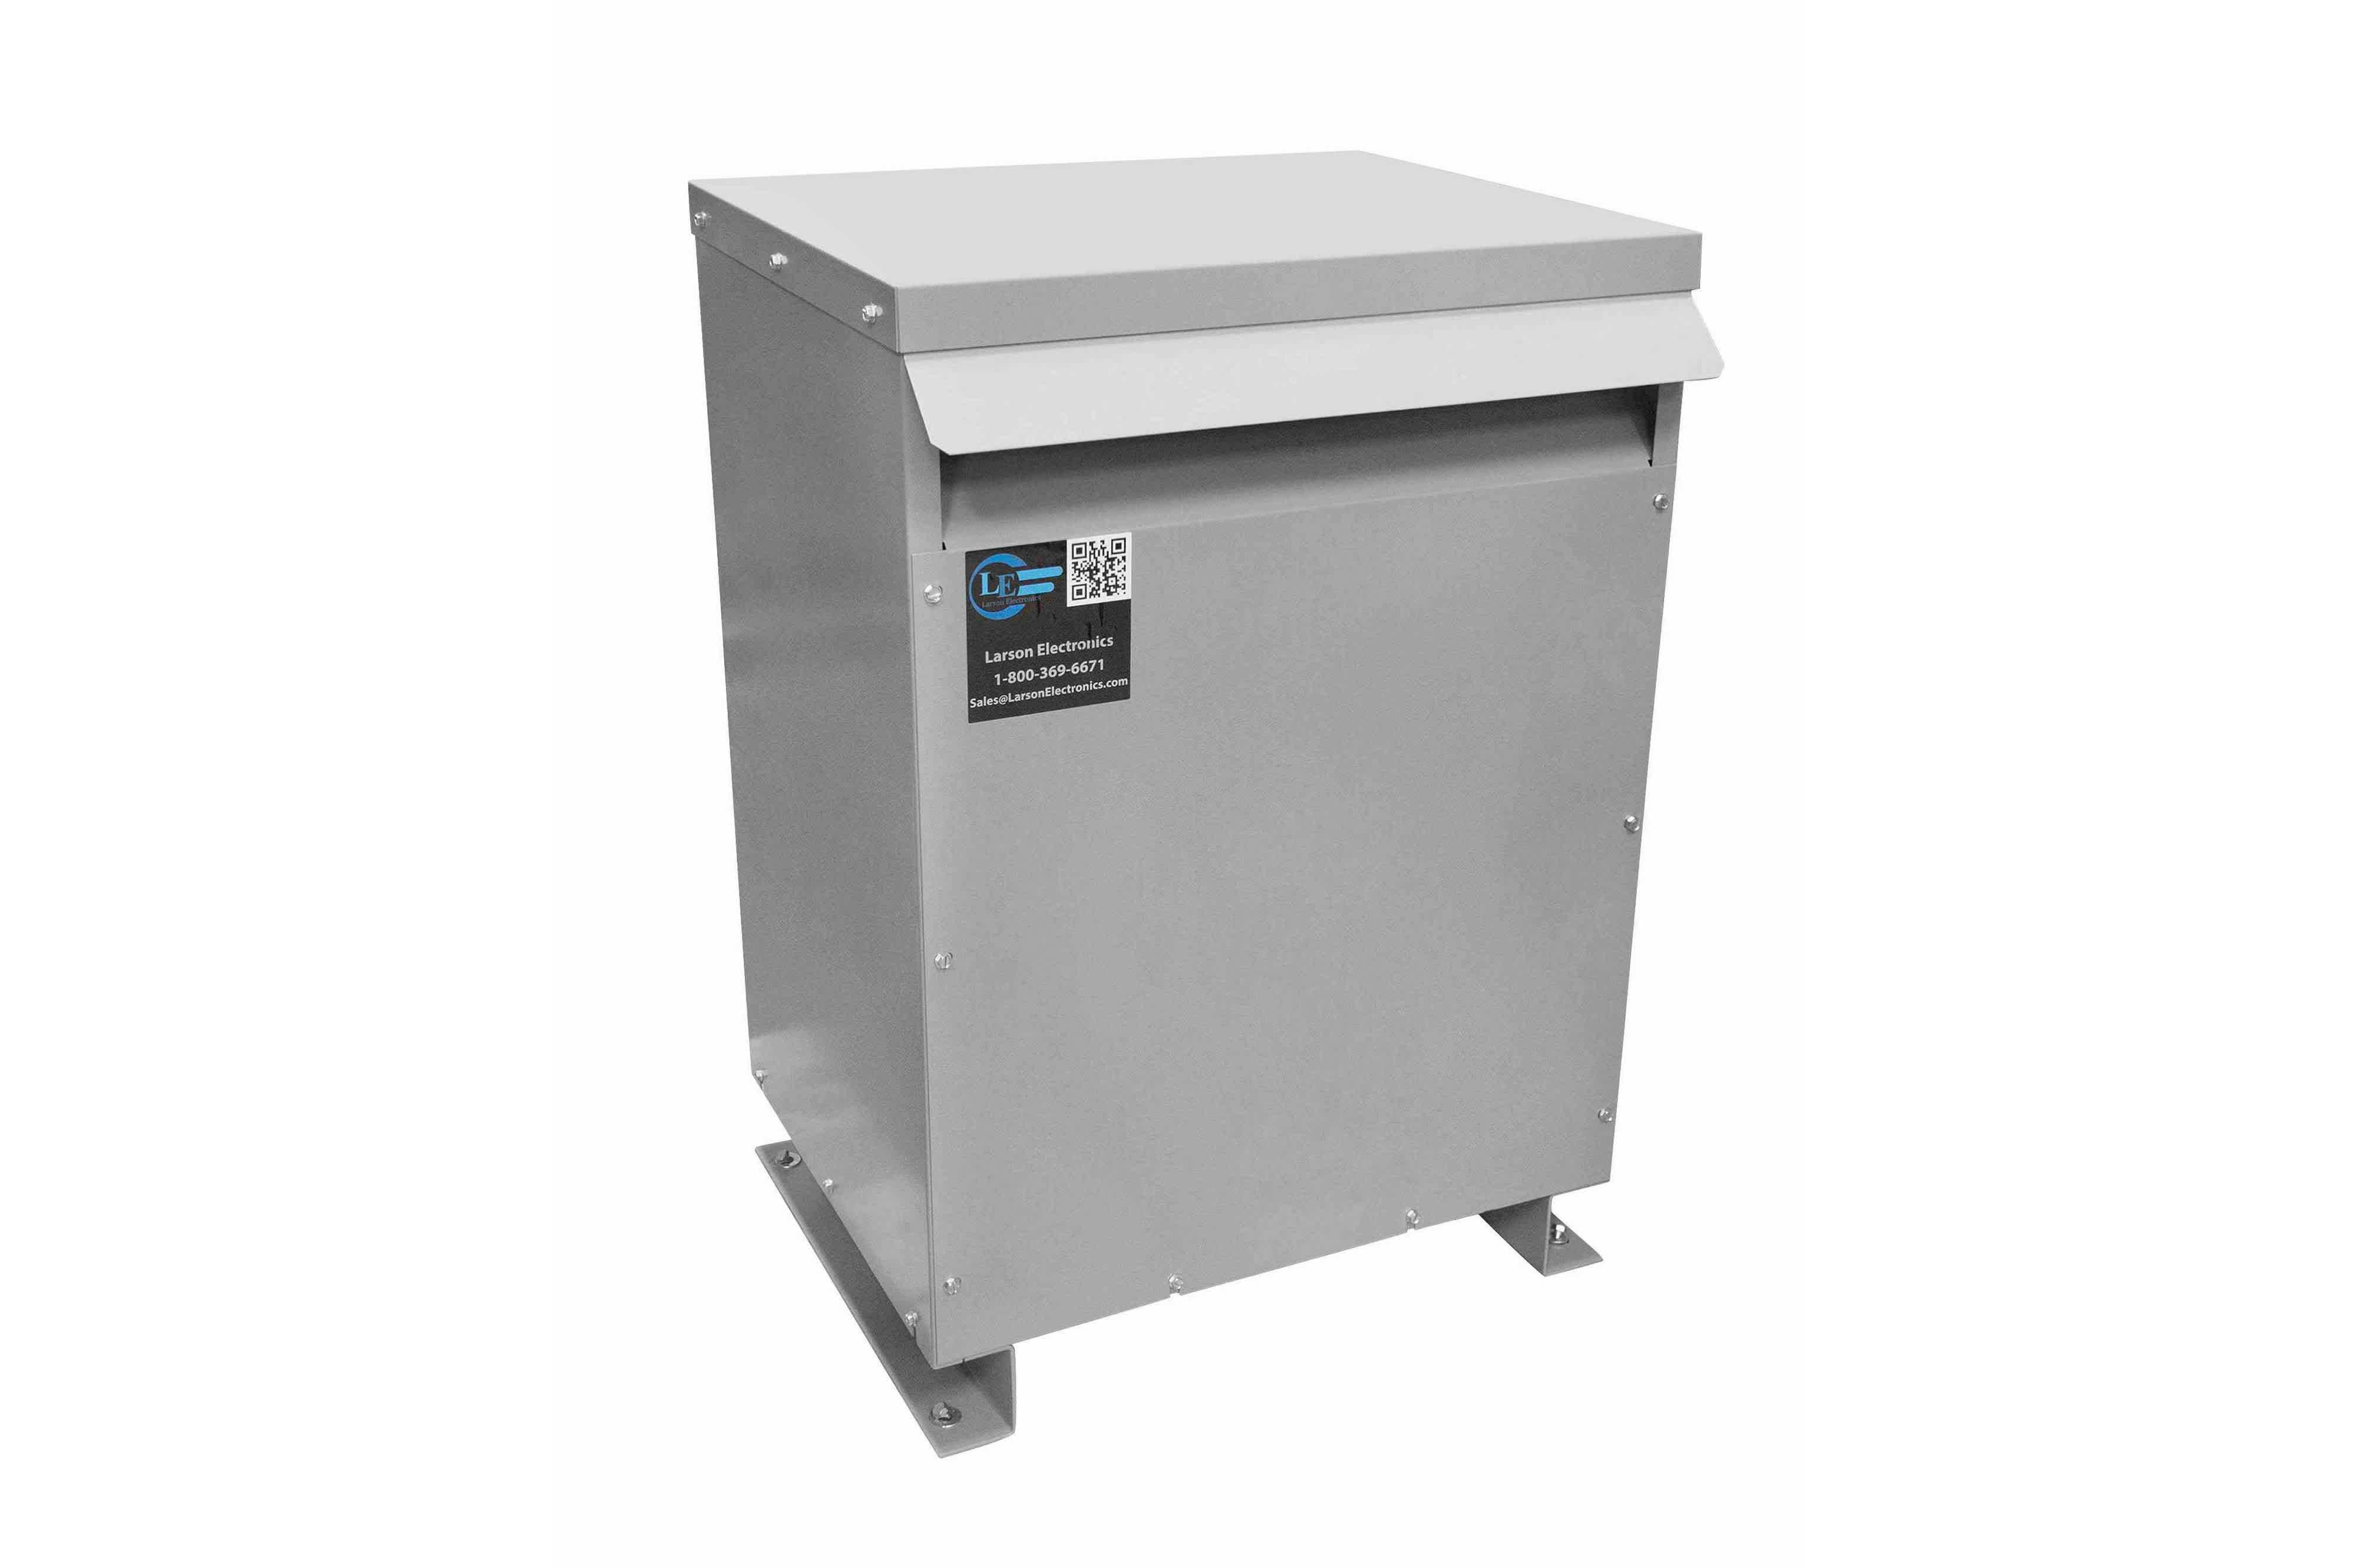 36 kVA 3PH Isolation Transformer, 440V Wye Primary, 208Y/120 Wye-N Secondary, N3R, Ventilated, 60 Hz